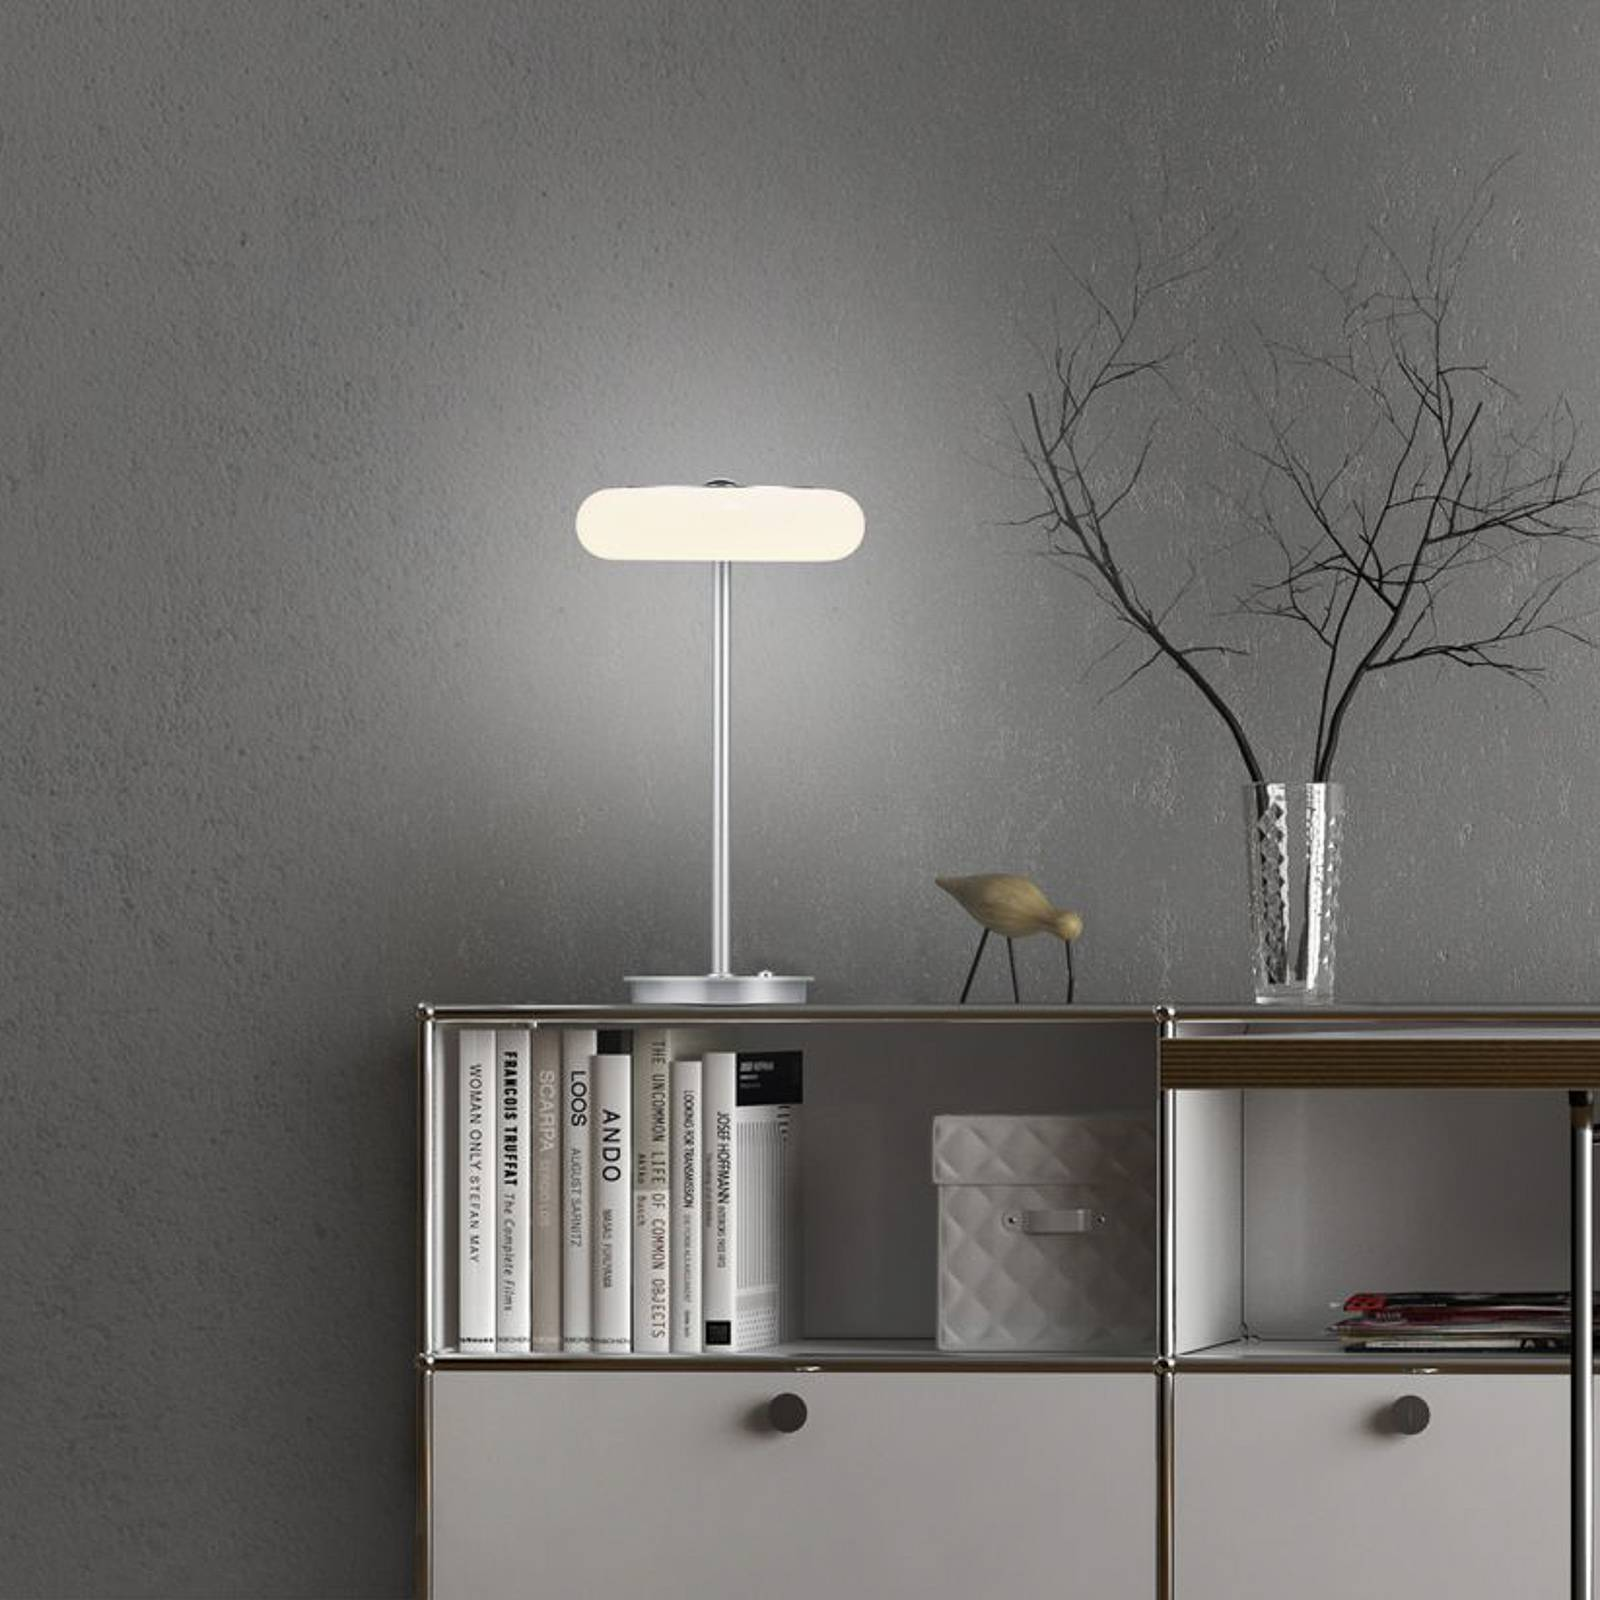 BANKAMP Centa LED-pöytälamppu, nikkeli